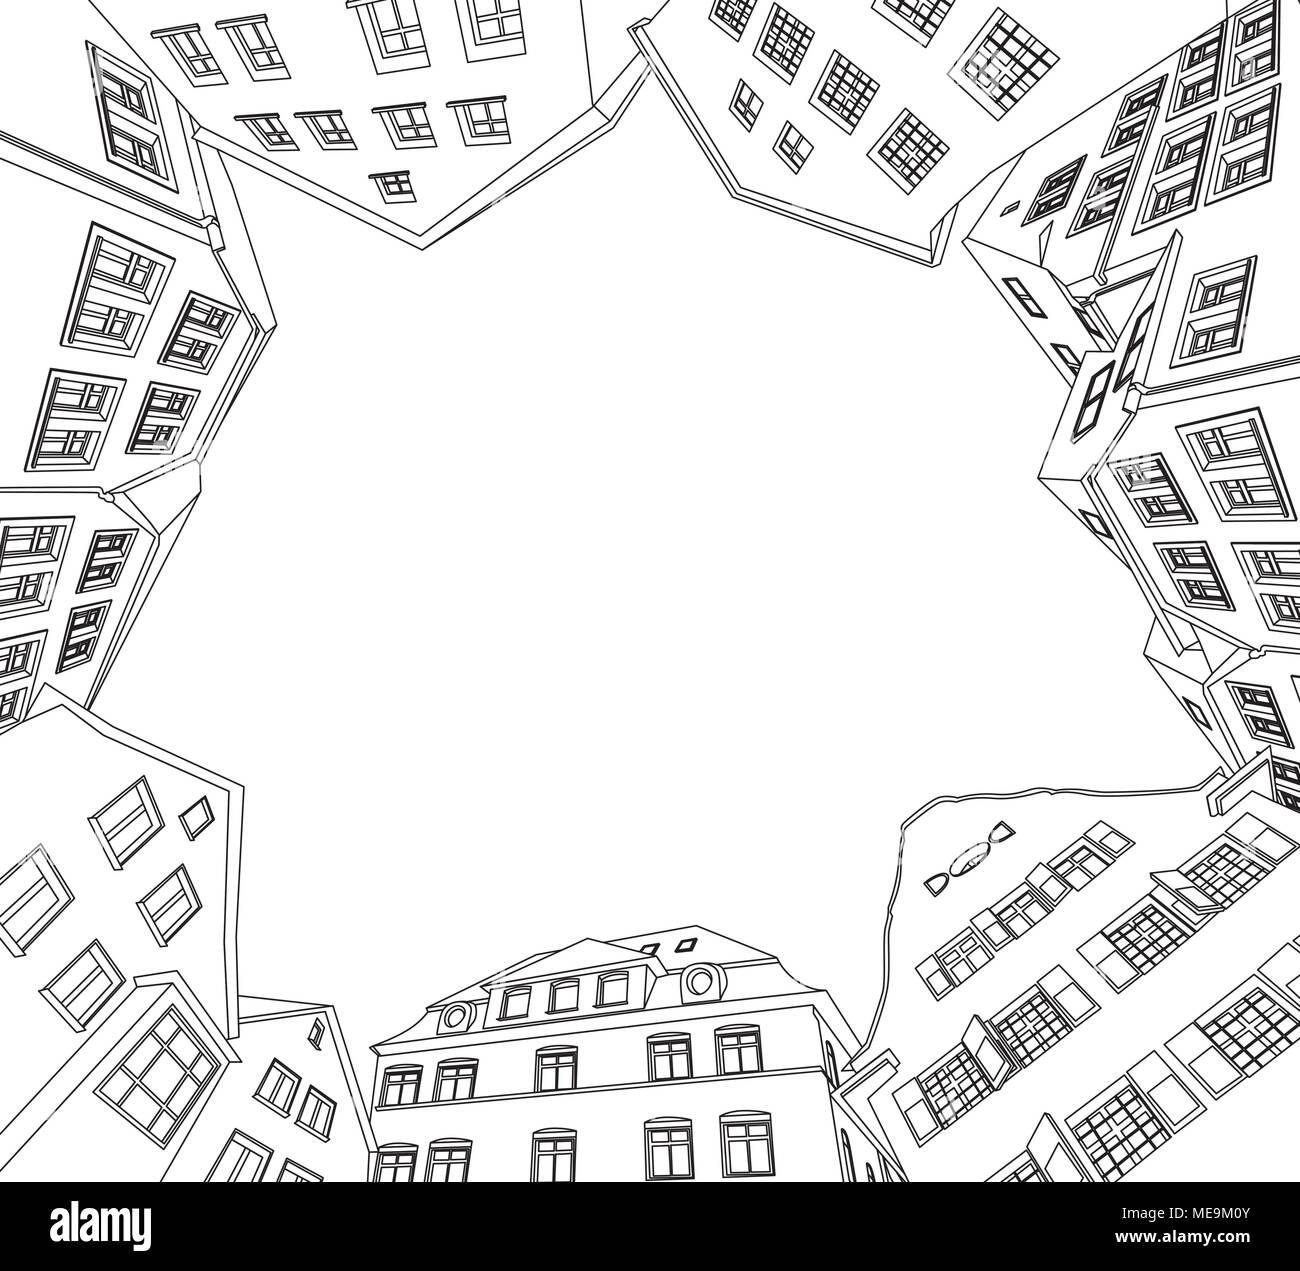 Vector illustration of european old city. - Stock Vector